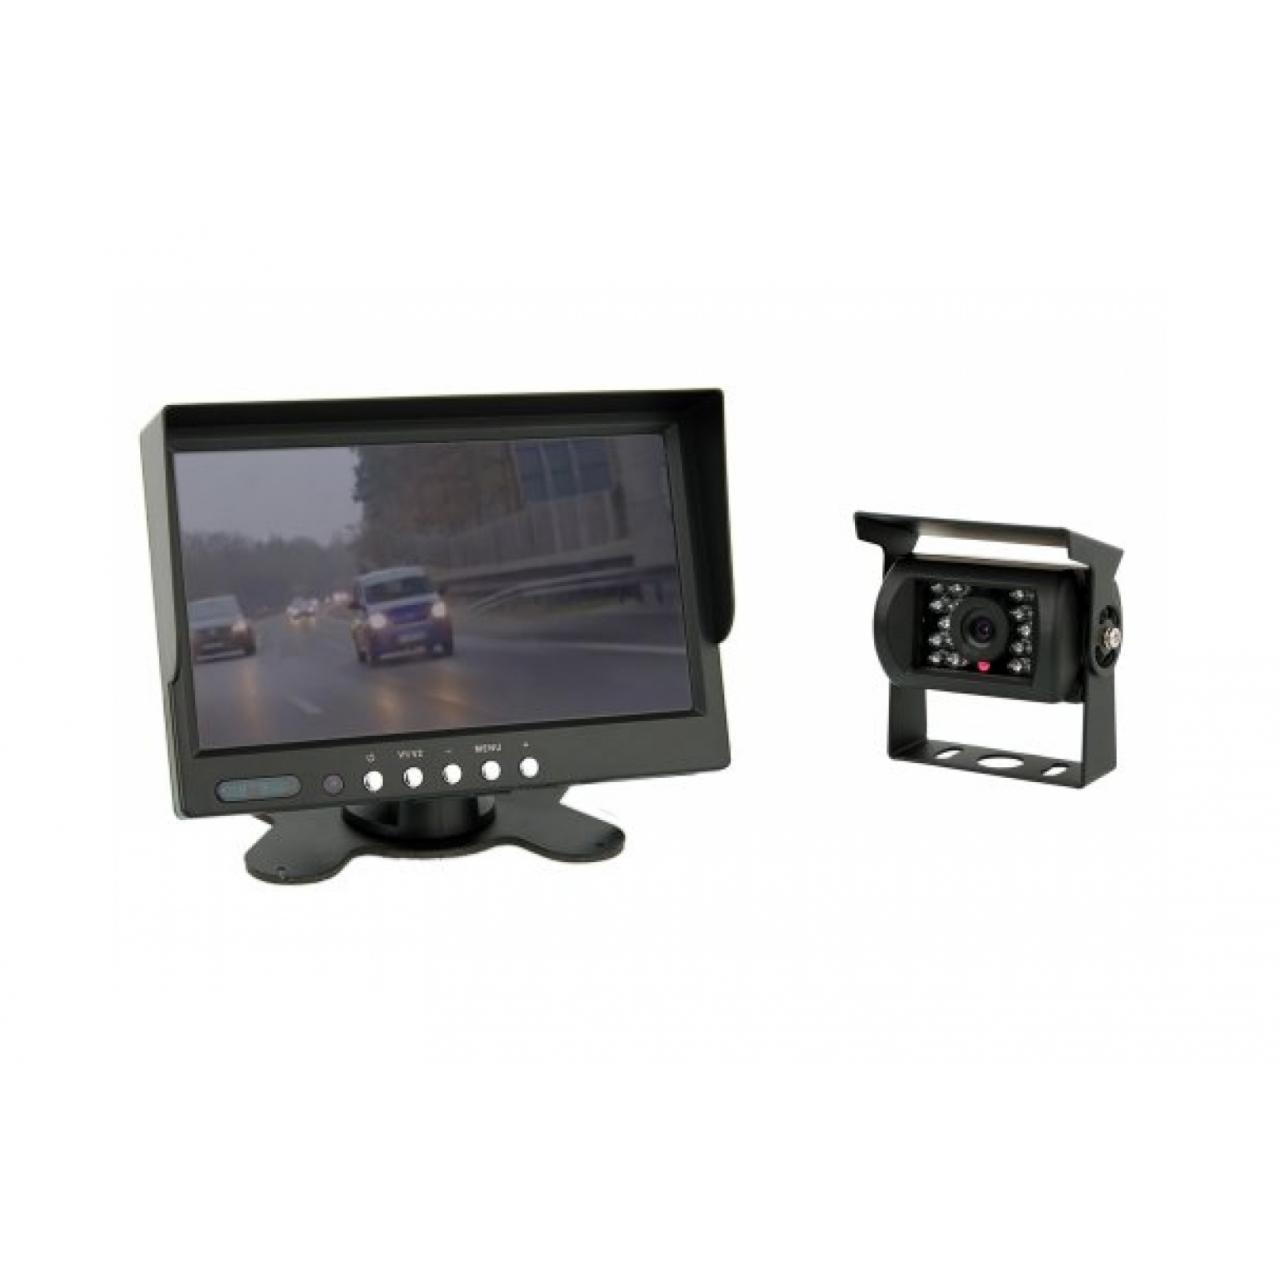 r ckfahrkamerasystem mit 7 zoll tft farb monitor farb kamera ip67 test. Black Bedroom Furniture Sets. Home Design Ideas